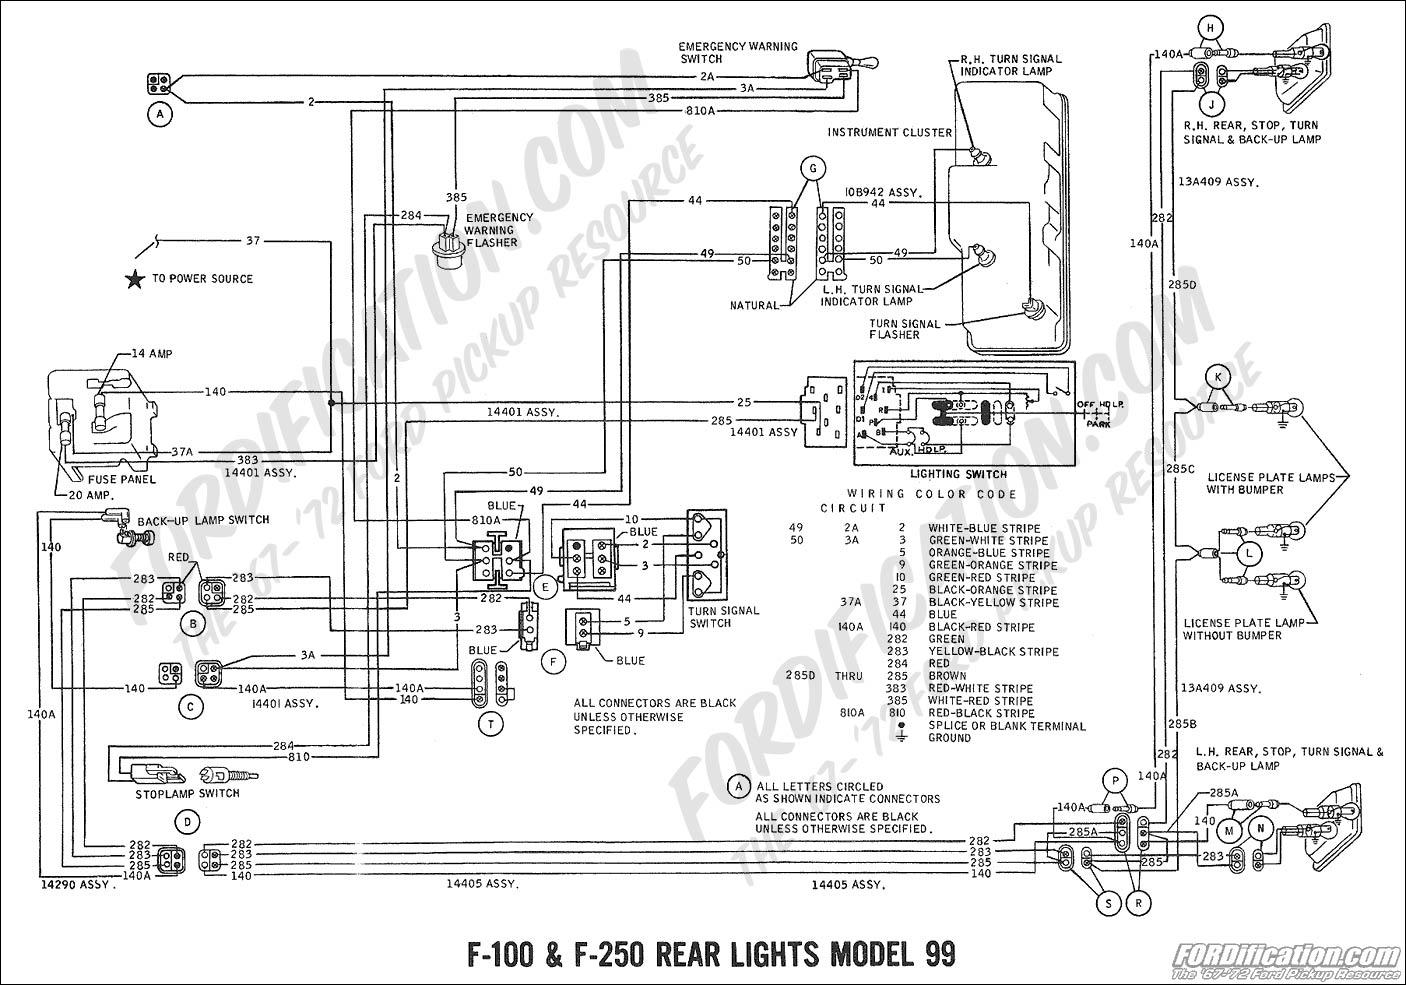 1973 triumph gt6 wiring diagram